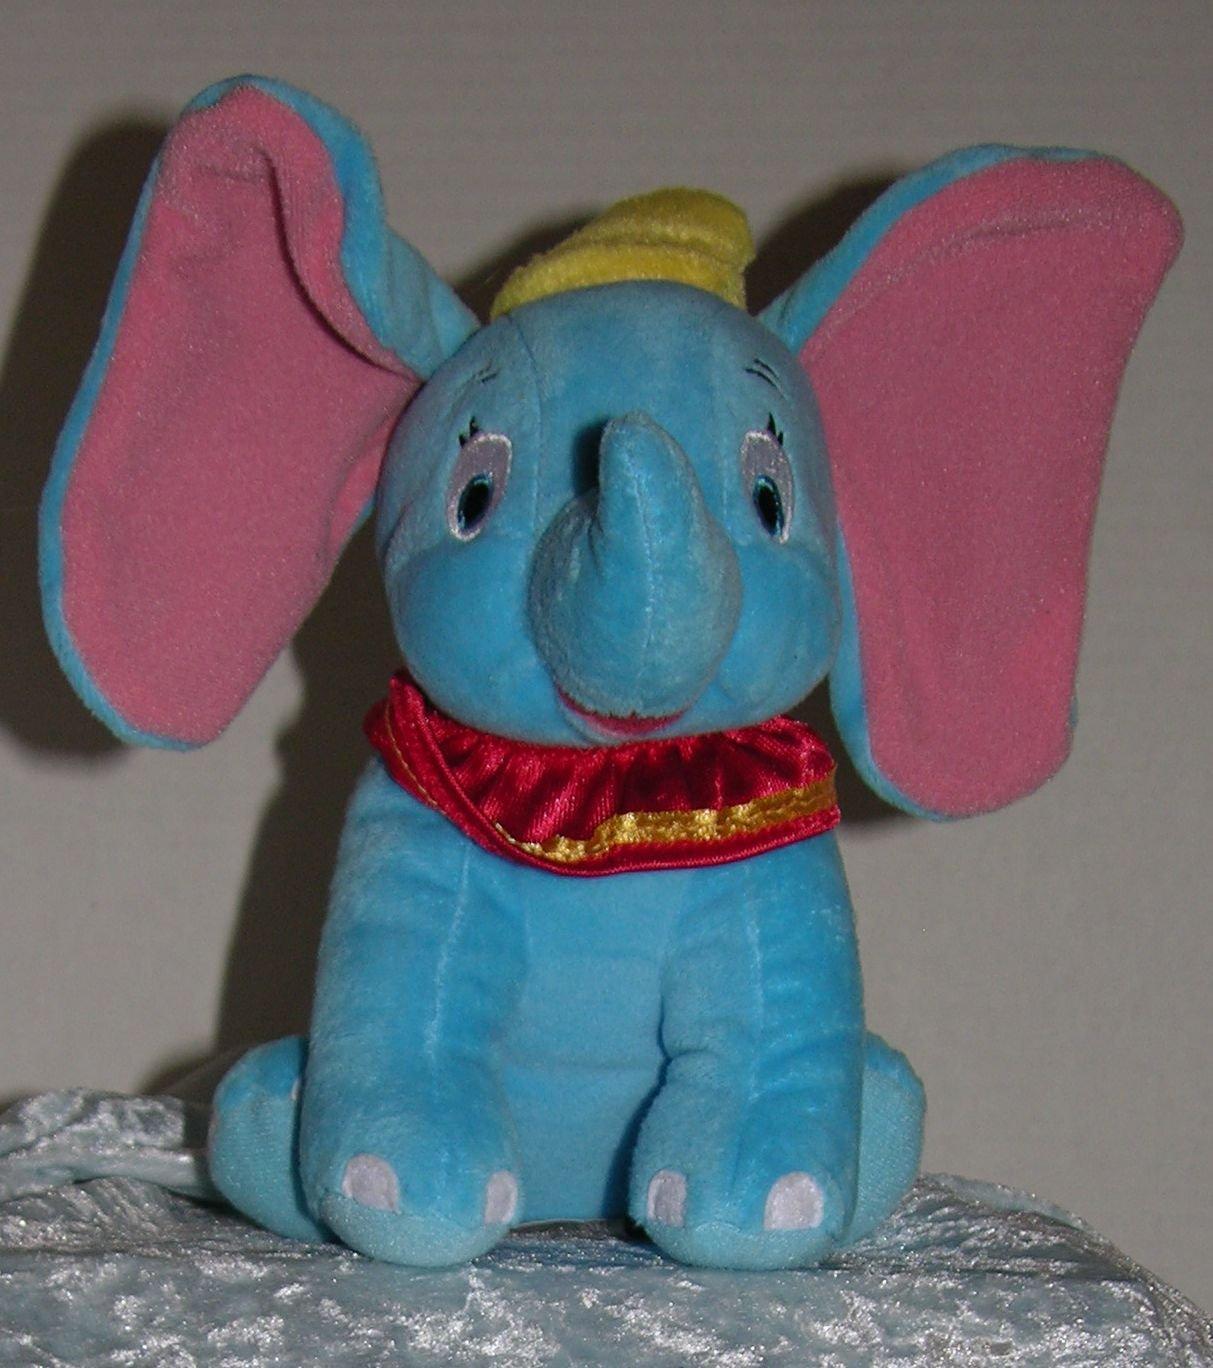 "* Disney's Dumbo Soft Plush Toy 7 1/2"" Stuffed"